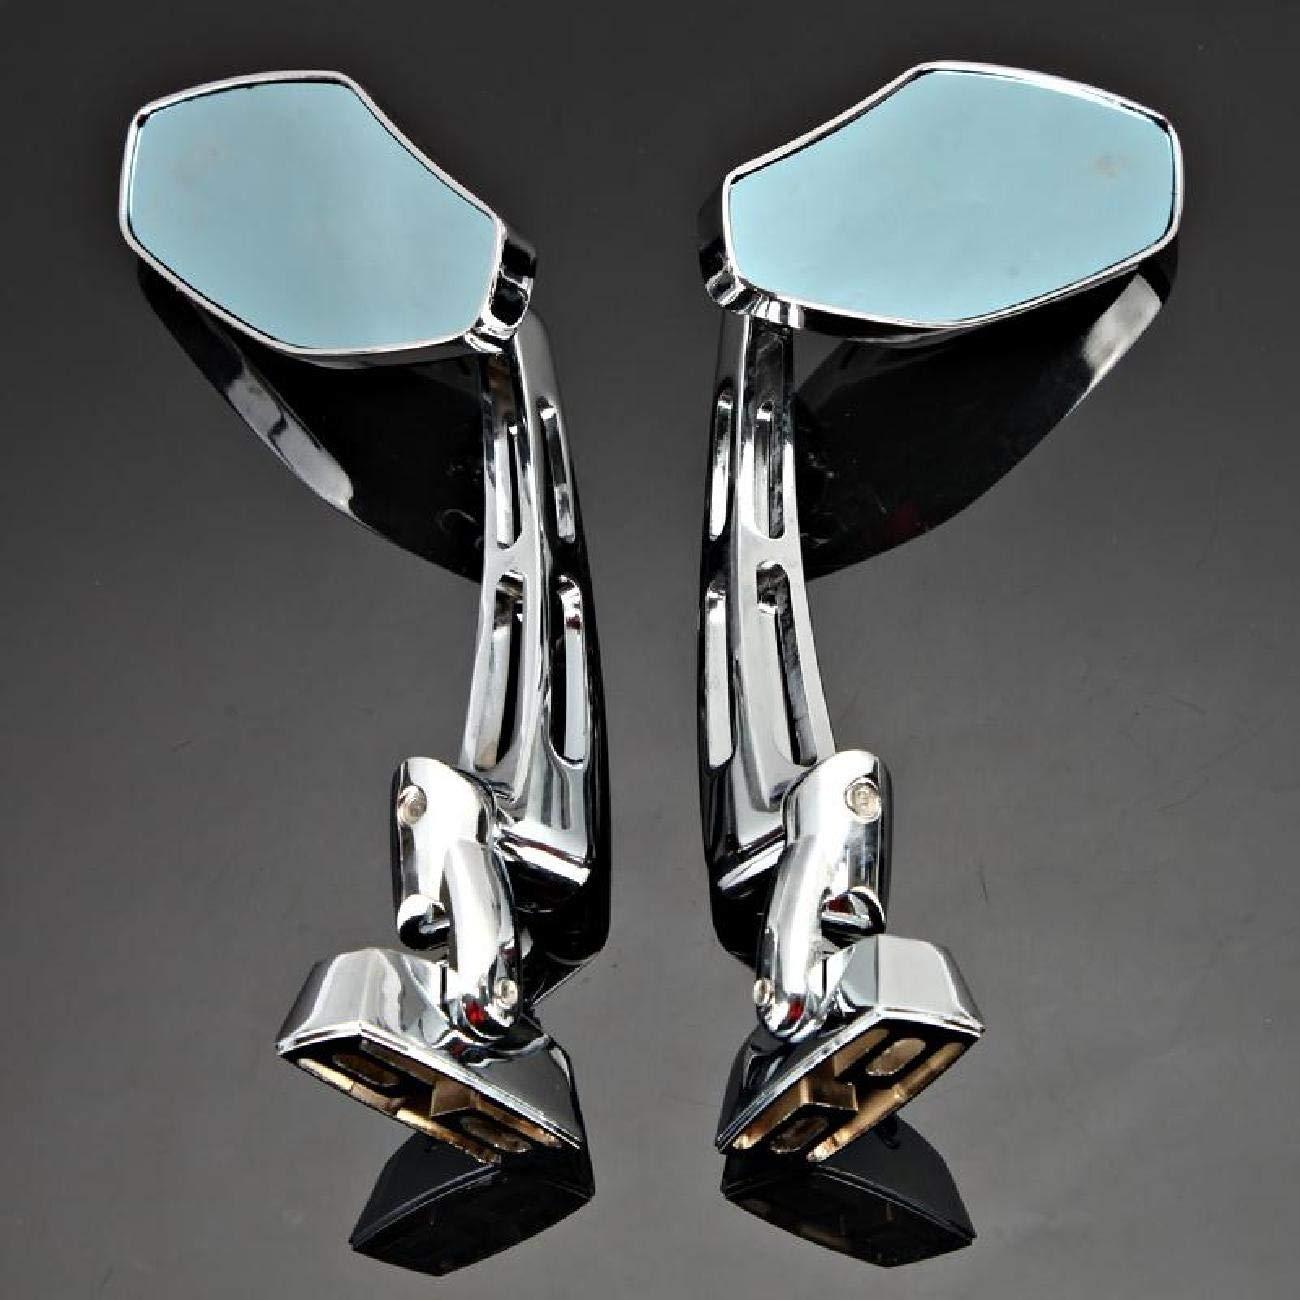 Black Racing Rearview Mirrors CNC Aluminum Anti-glare Side Mirror for Honda CBR 600 F3 F4i Kawasaki Ninja ZX 6 7 9 12 Yamaha FZR YZF R1 R6 S Suzuki GSXR Hayabusa INNOGLOW Motorcycle Mirrors